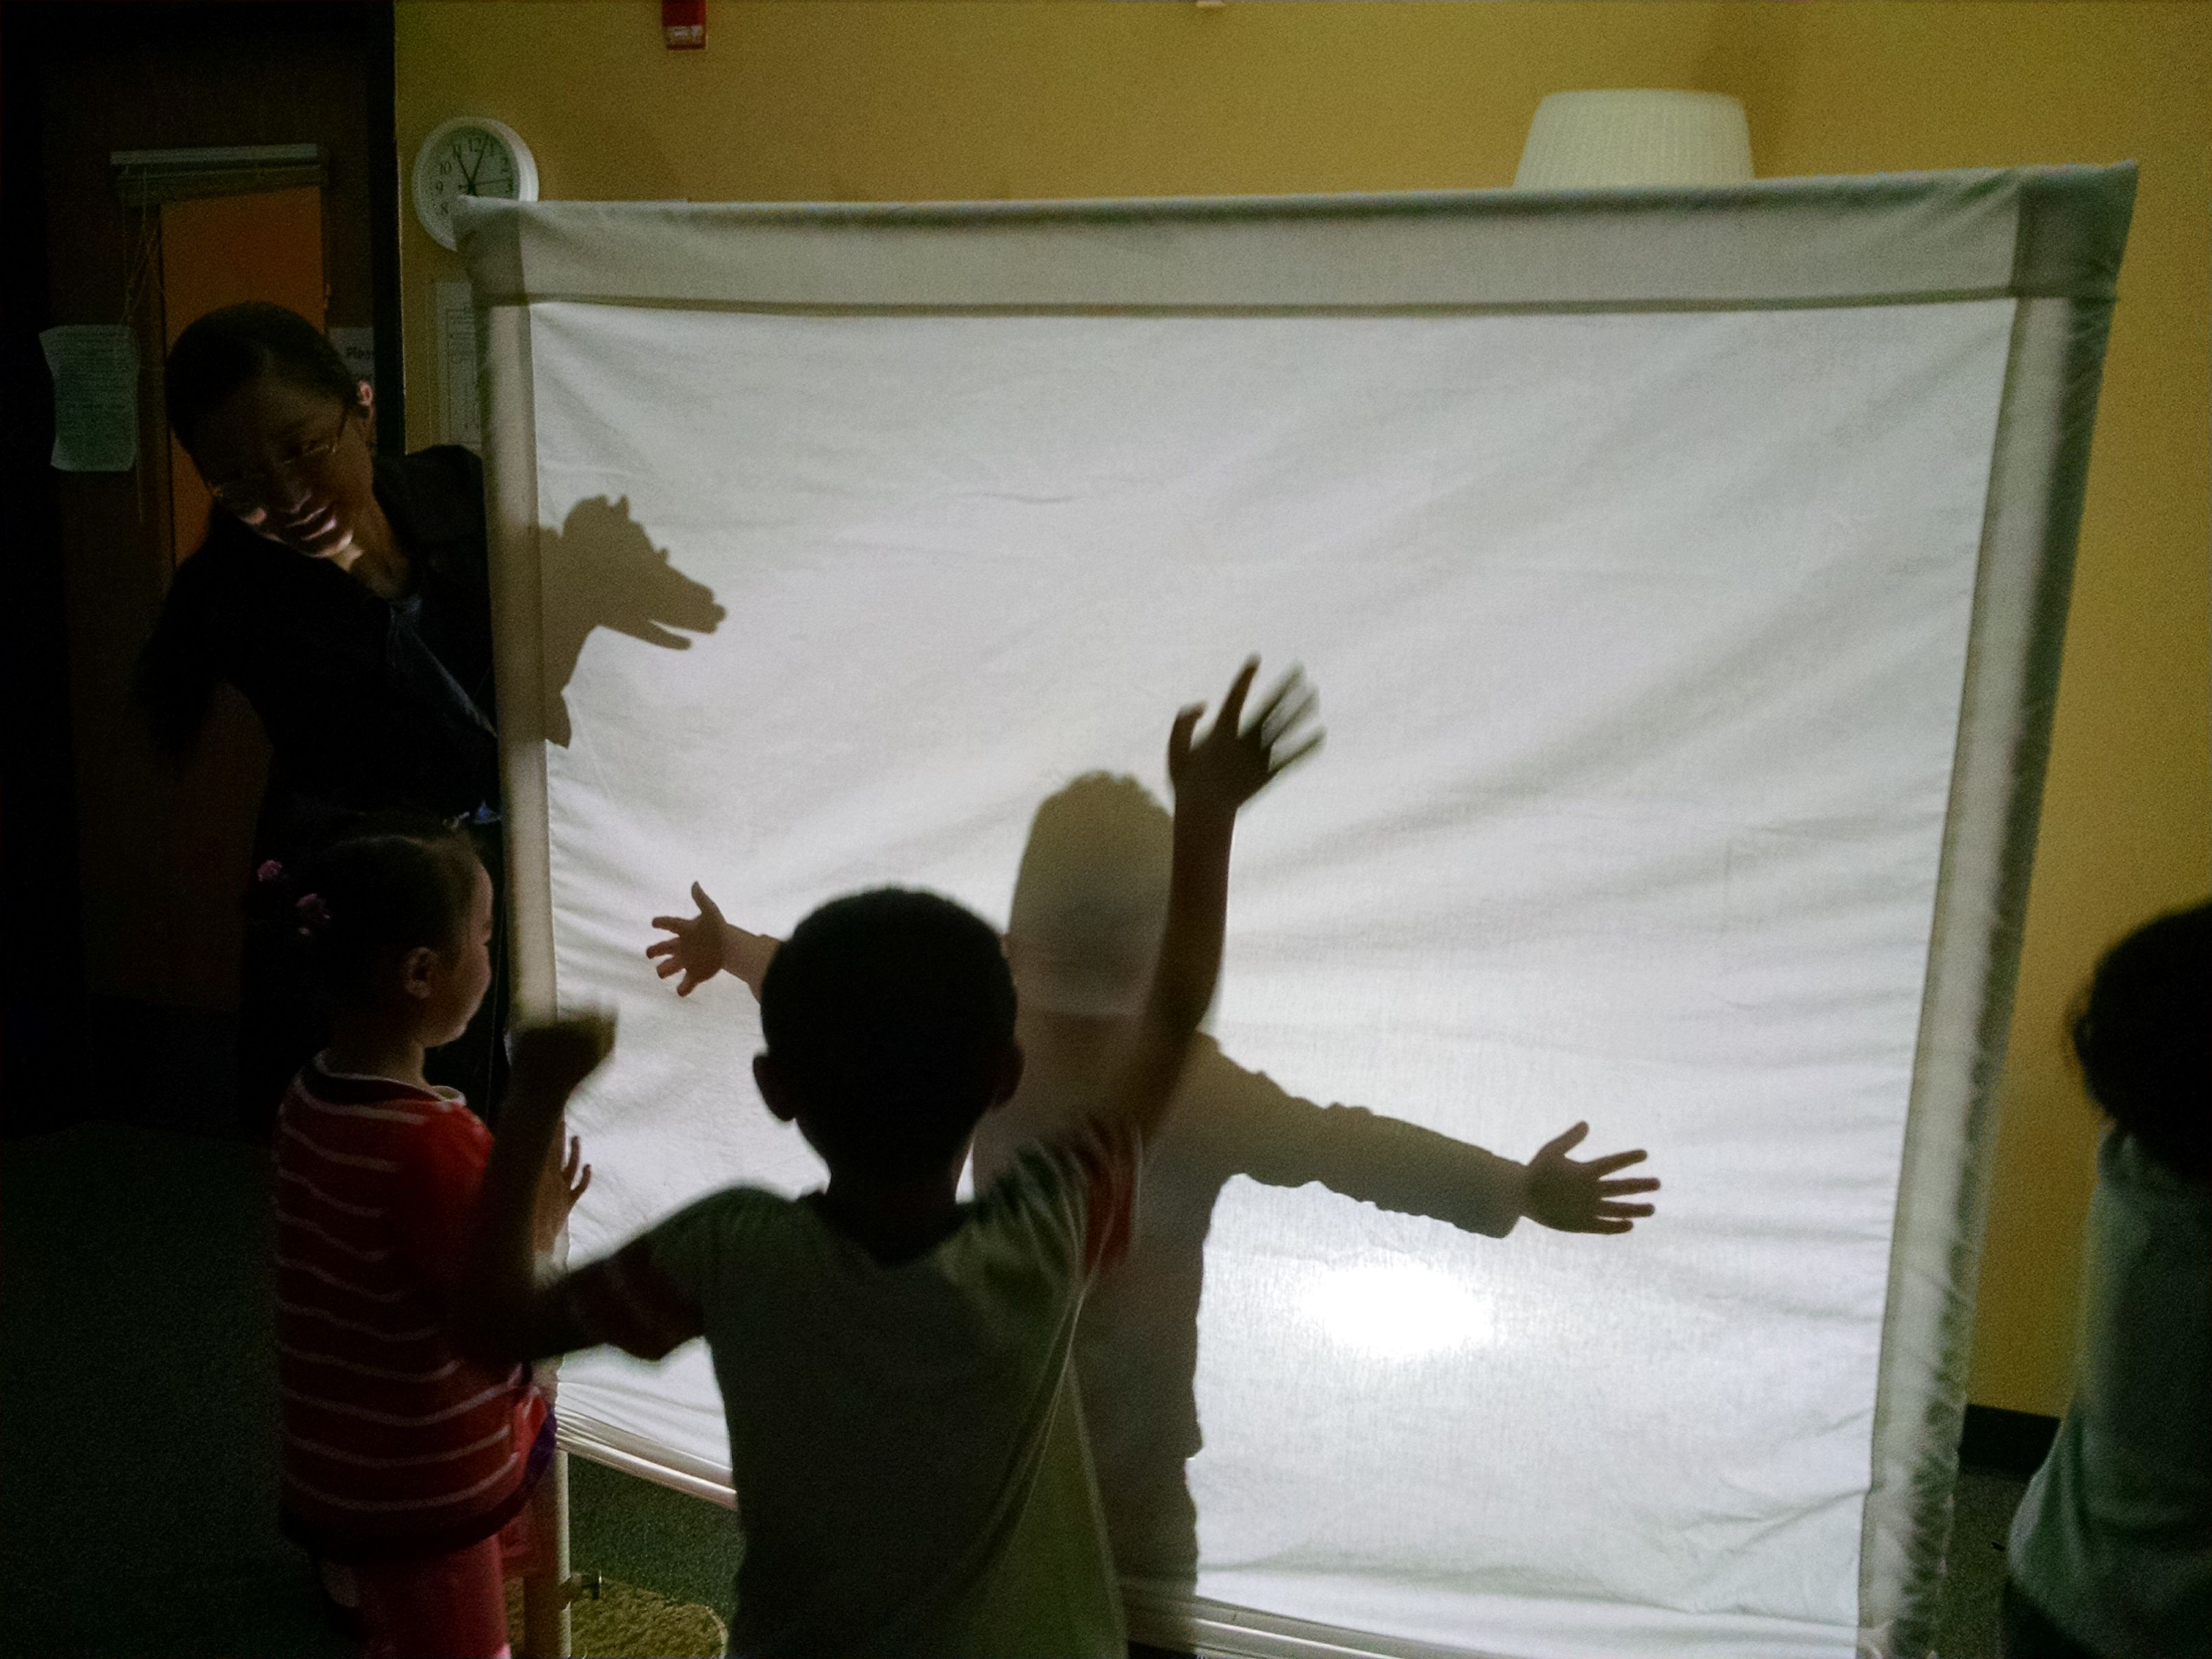 Preschool Science Class On Light And Shadows